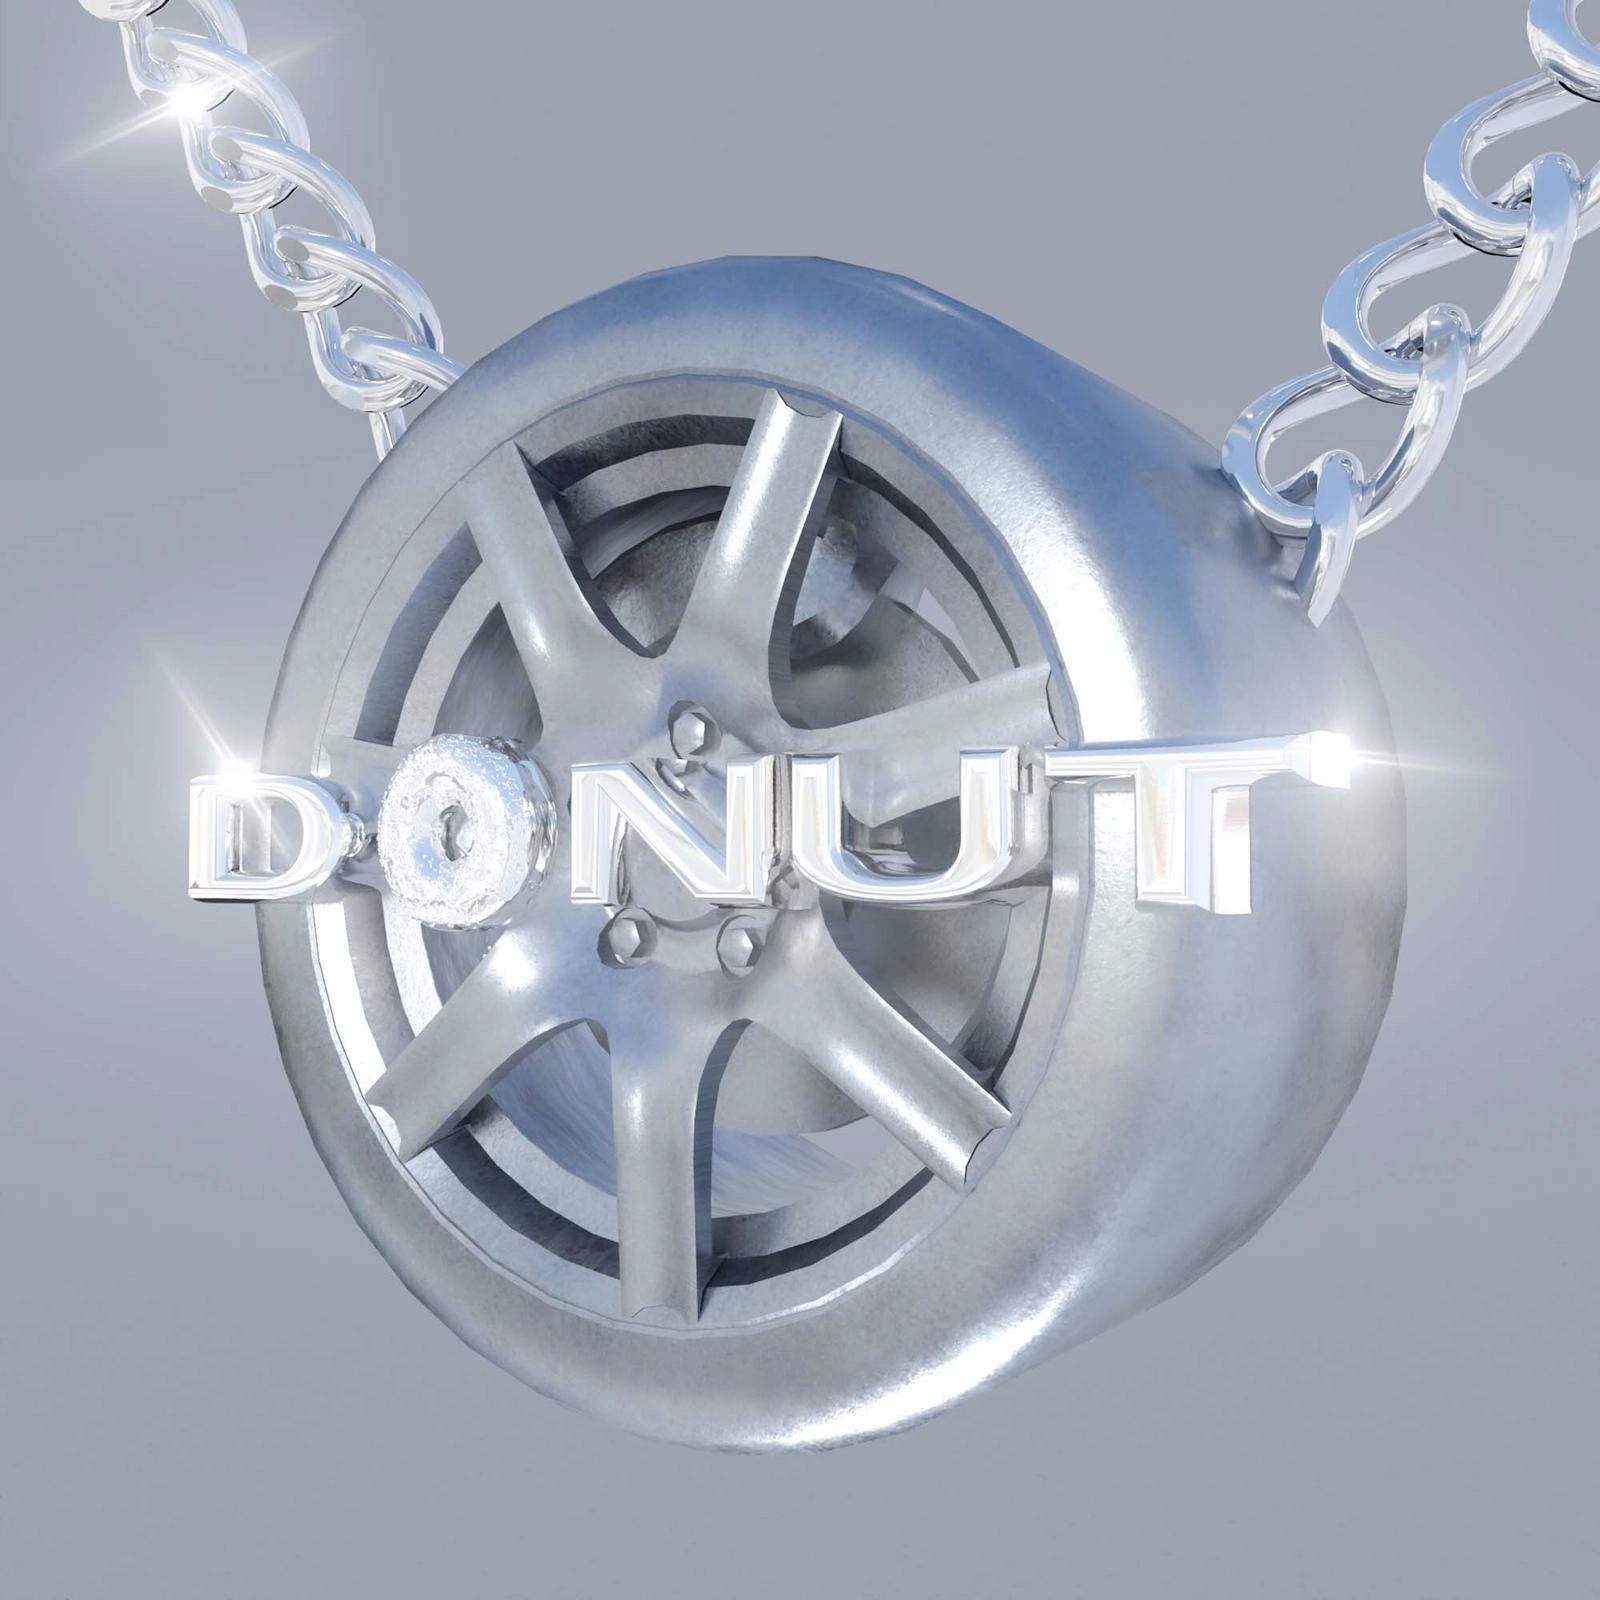 Upcoming: Pavilions Exit & Yung Rox - Donuts